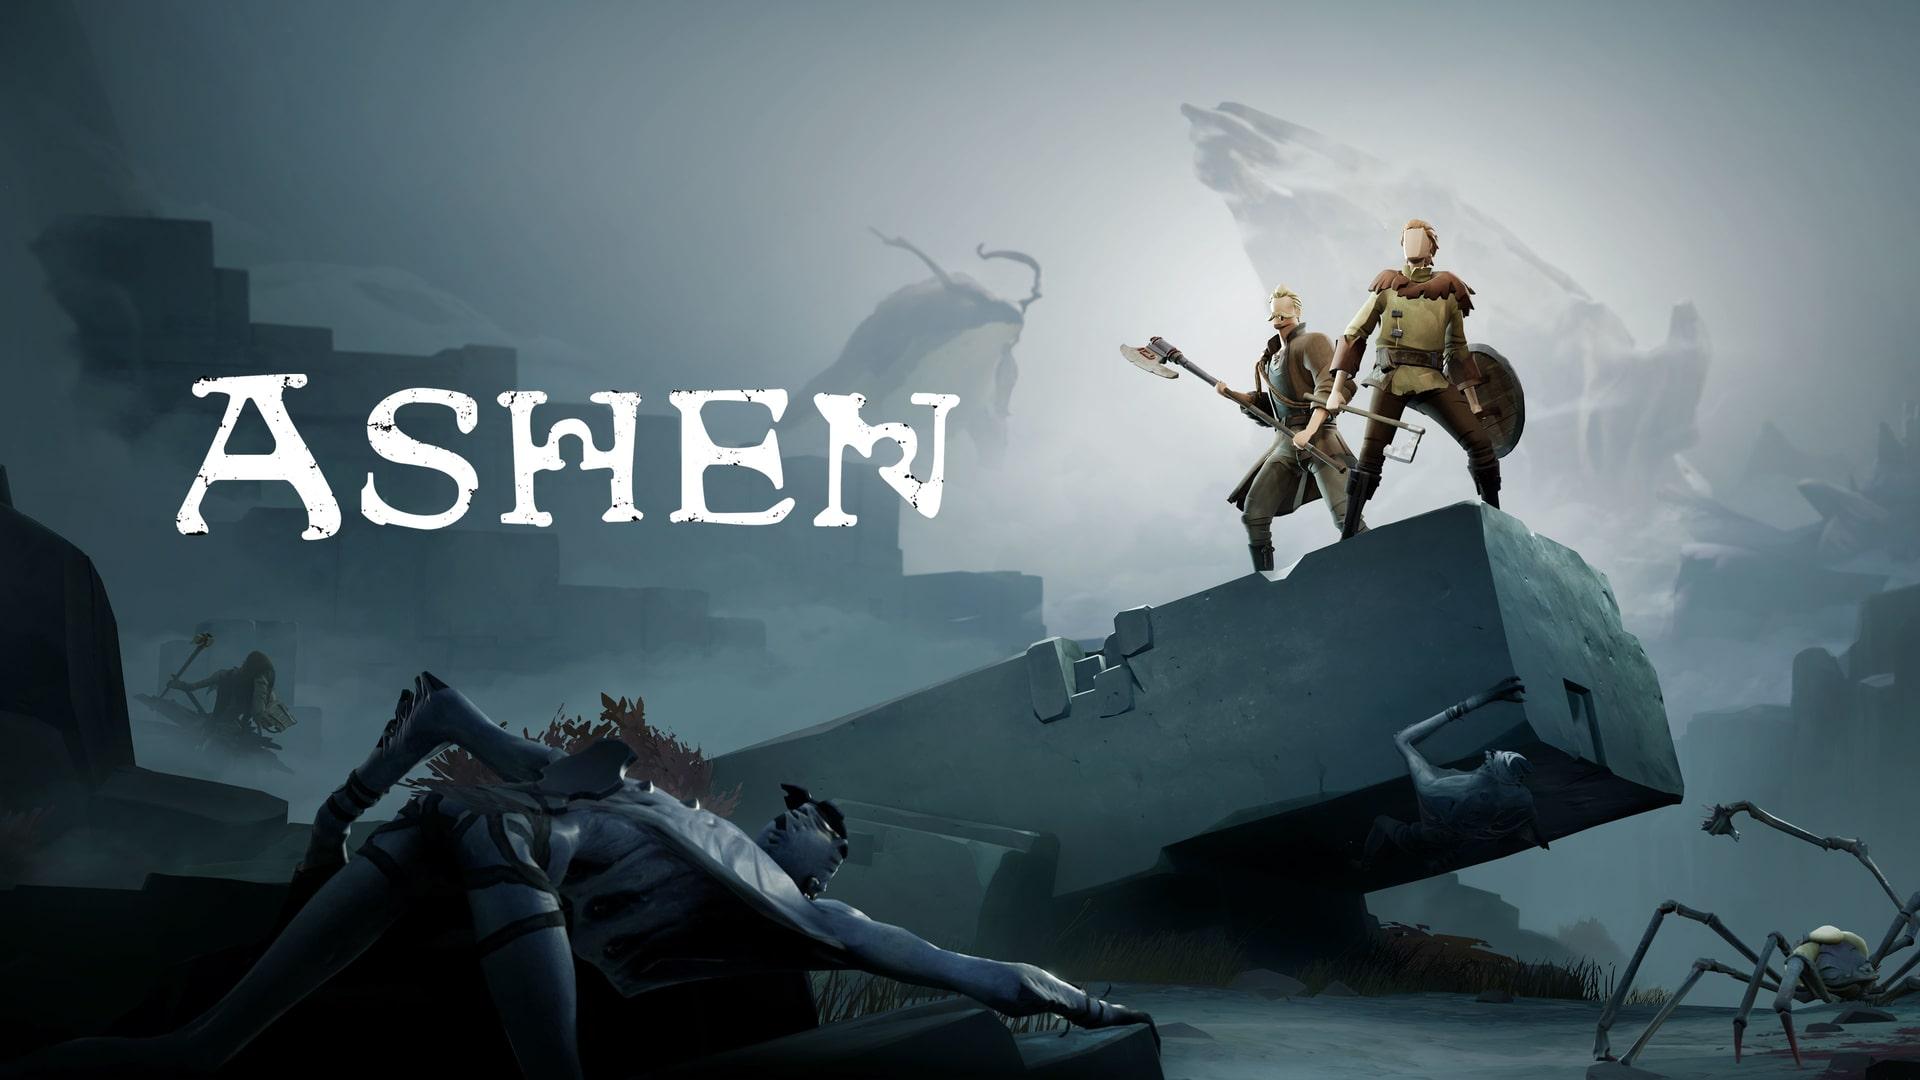 Ashen (中日英韩文版)